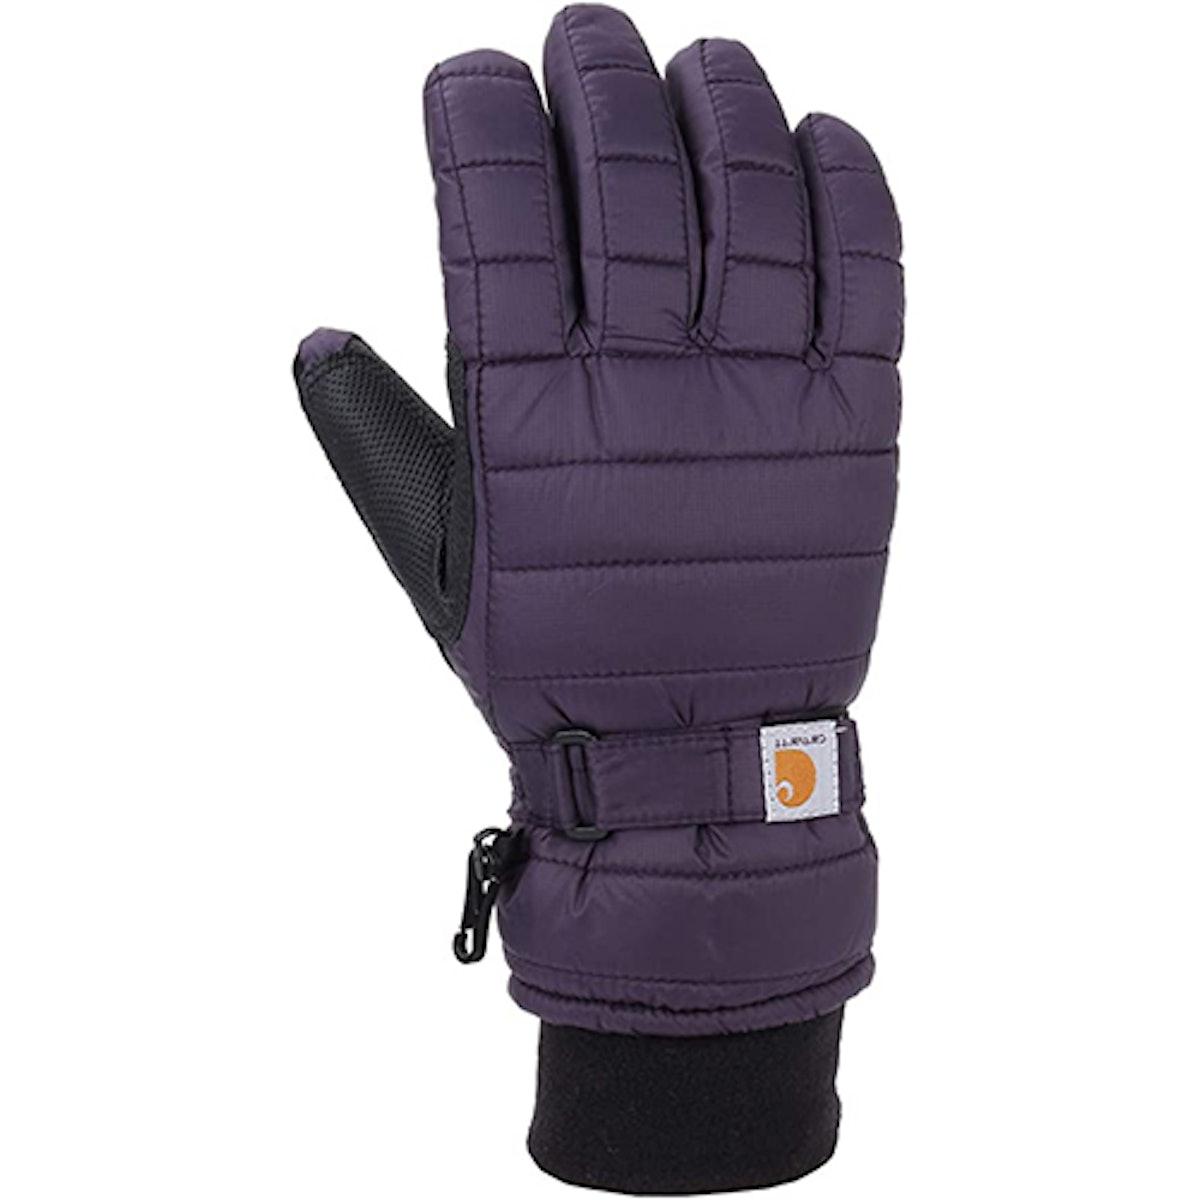 Carhartt Insulated Glove With Waterproof Insert